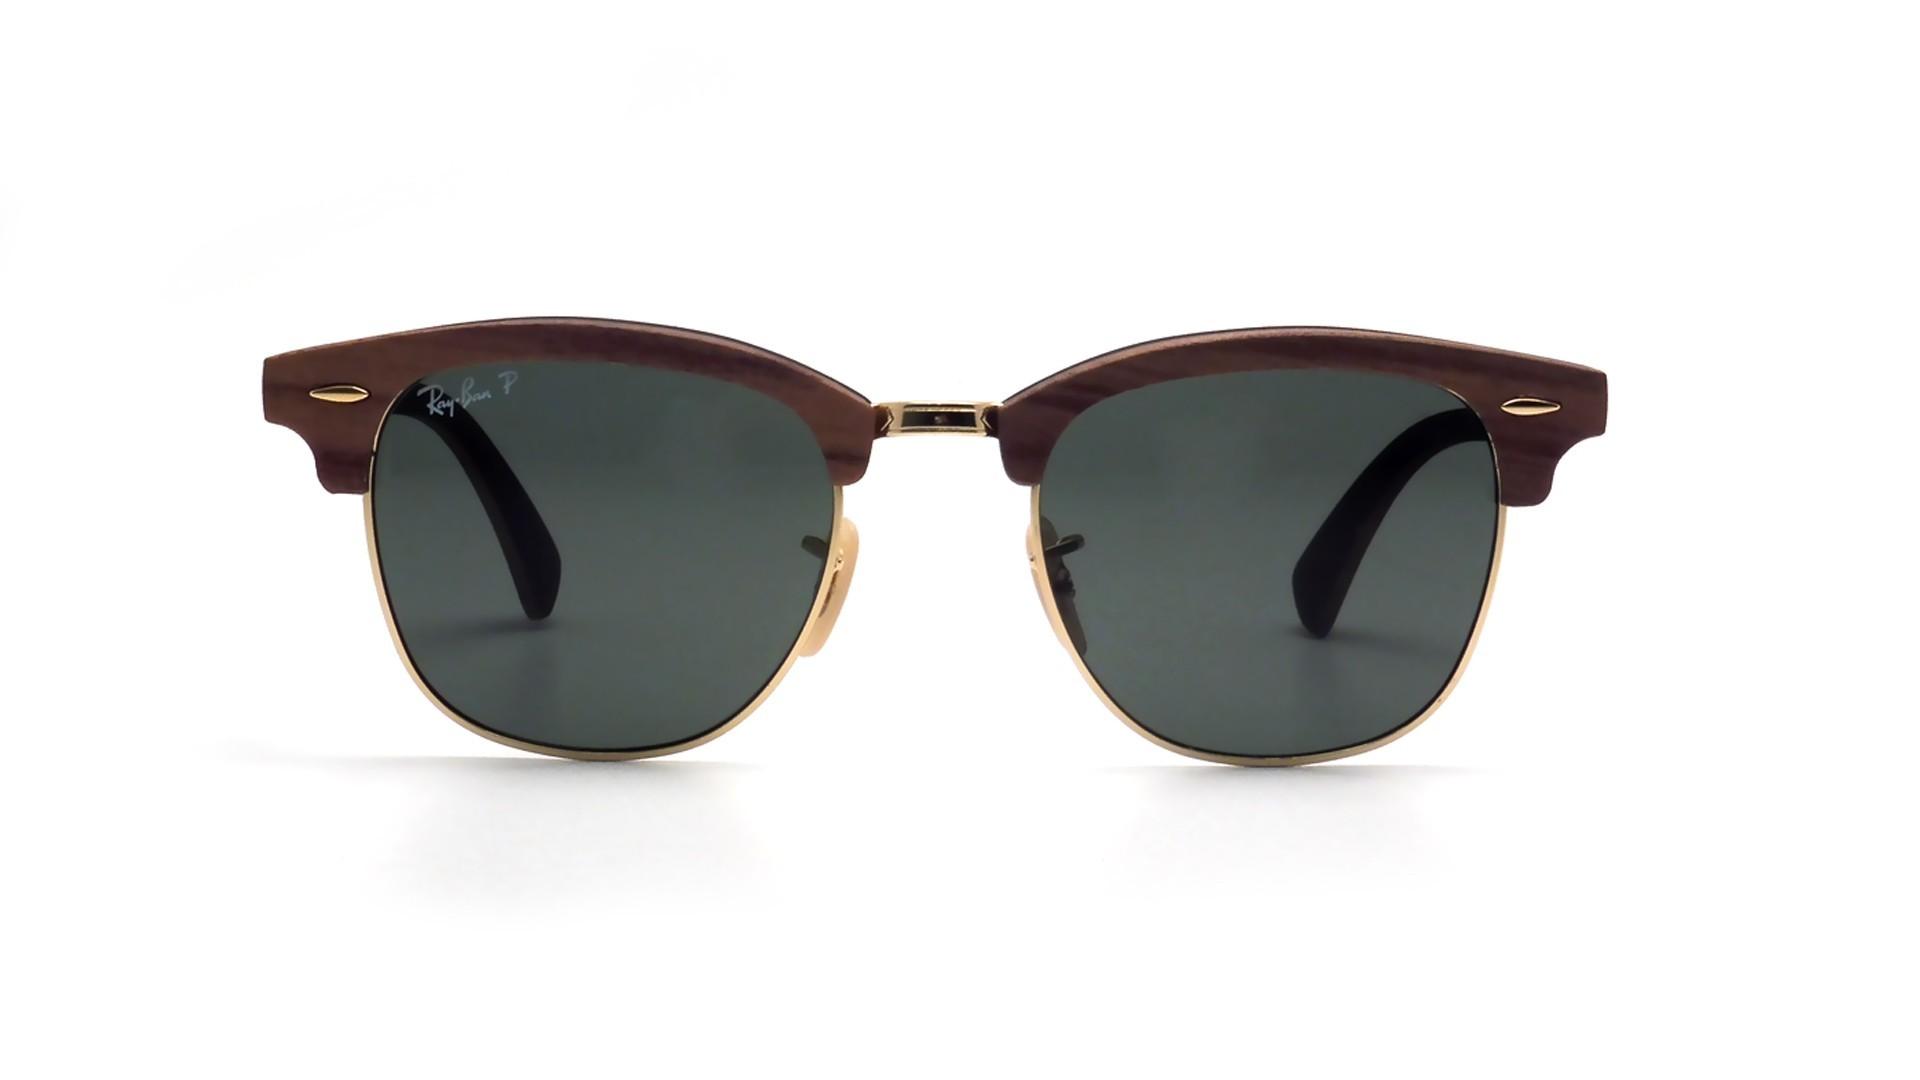 eb331240e89076 ... germany sunglasses ray ban clubmaster wood brown rb3016m 118158 51 21  medium polarized 4b1d2 36714 ...